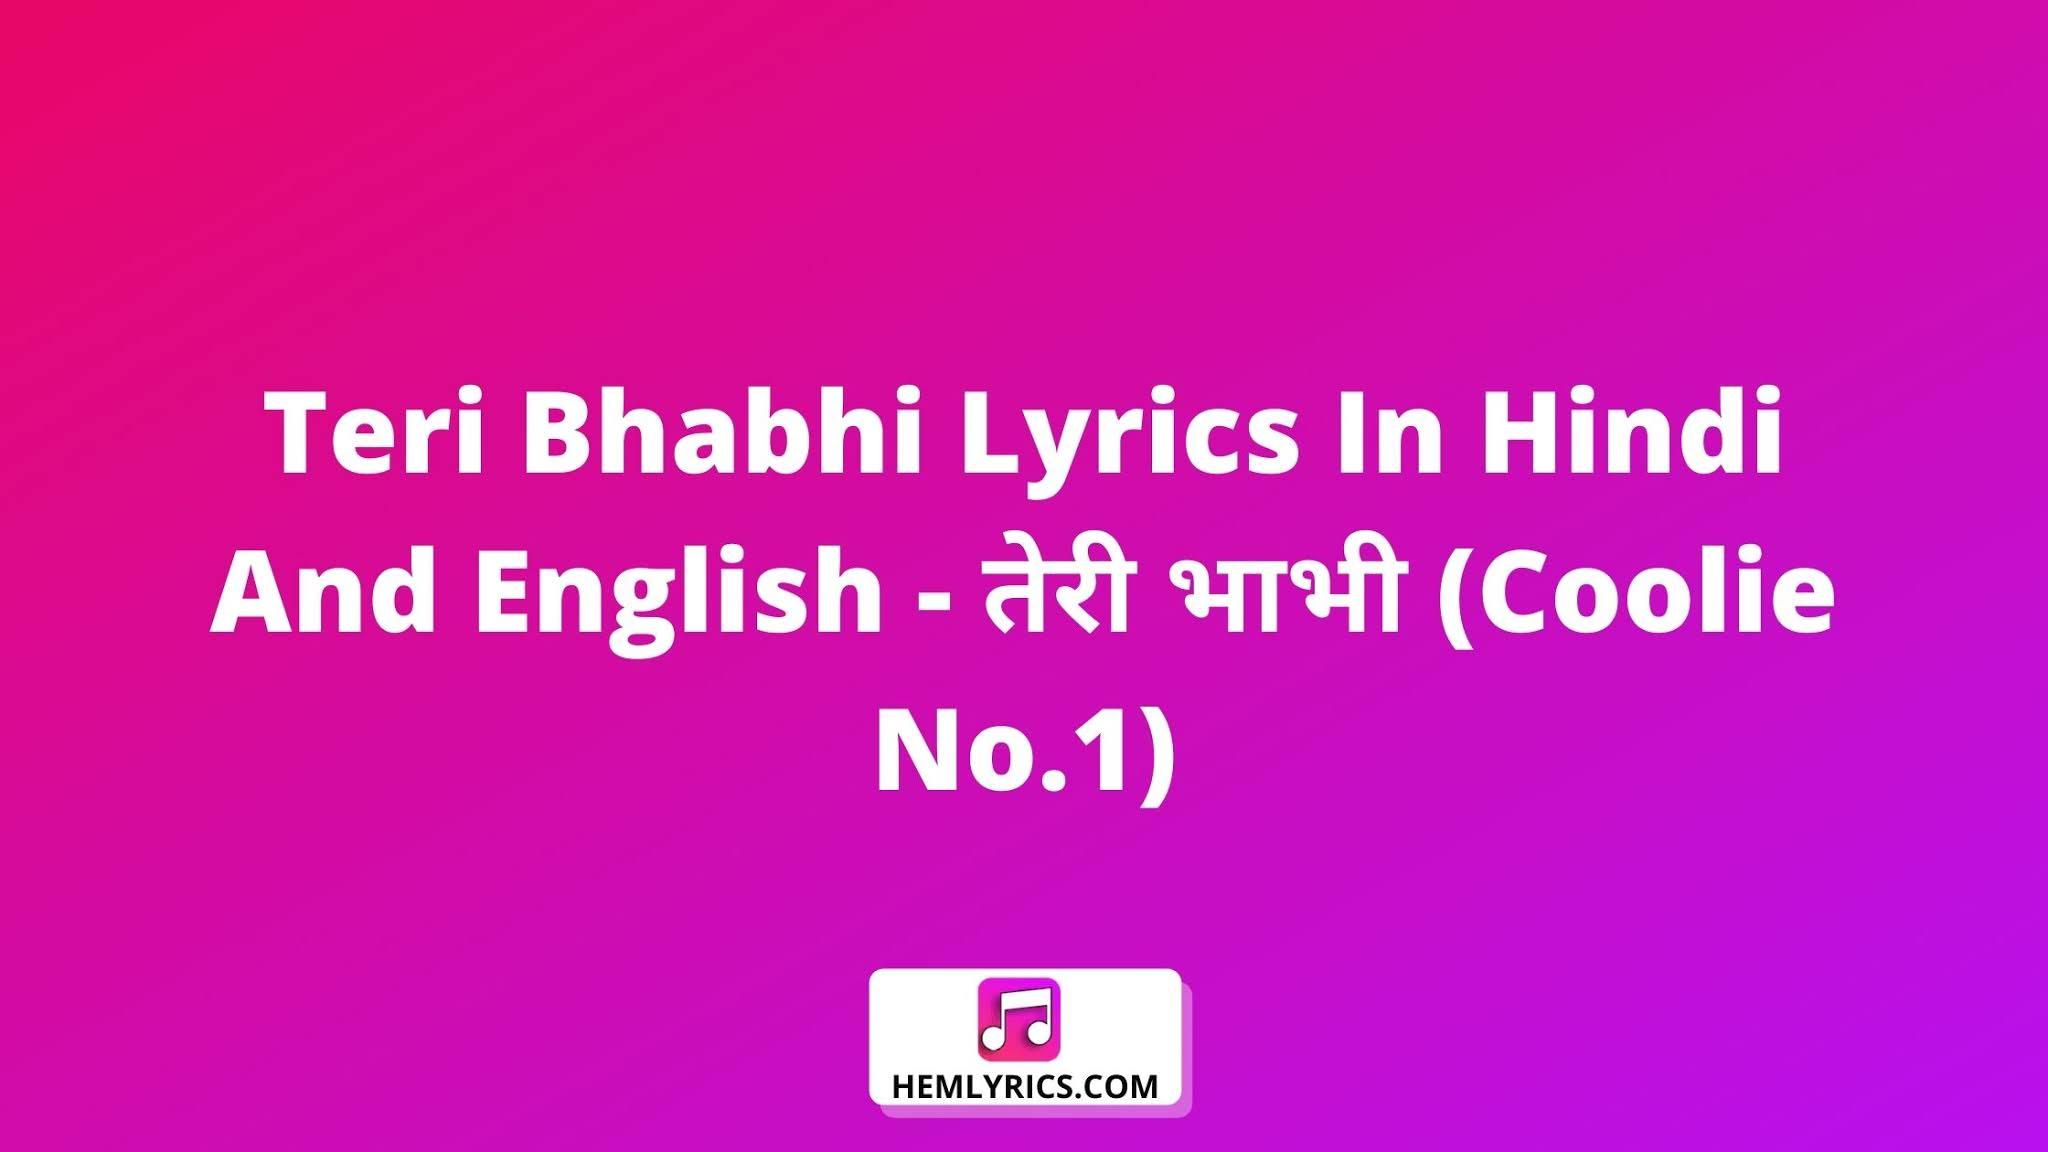 Teri Bhabhi Lyrics In Hindi And English - तेरी भाभी (Coolie No.1)